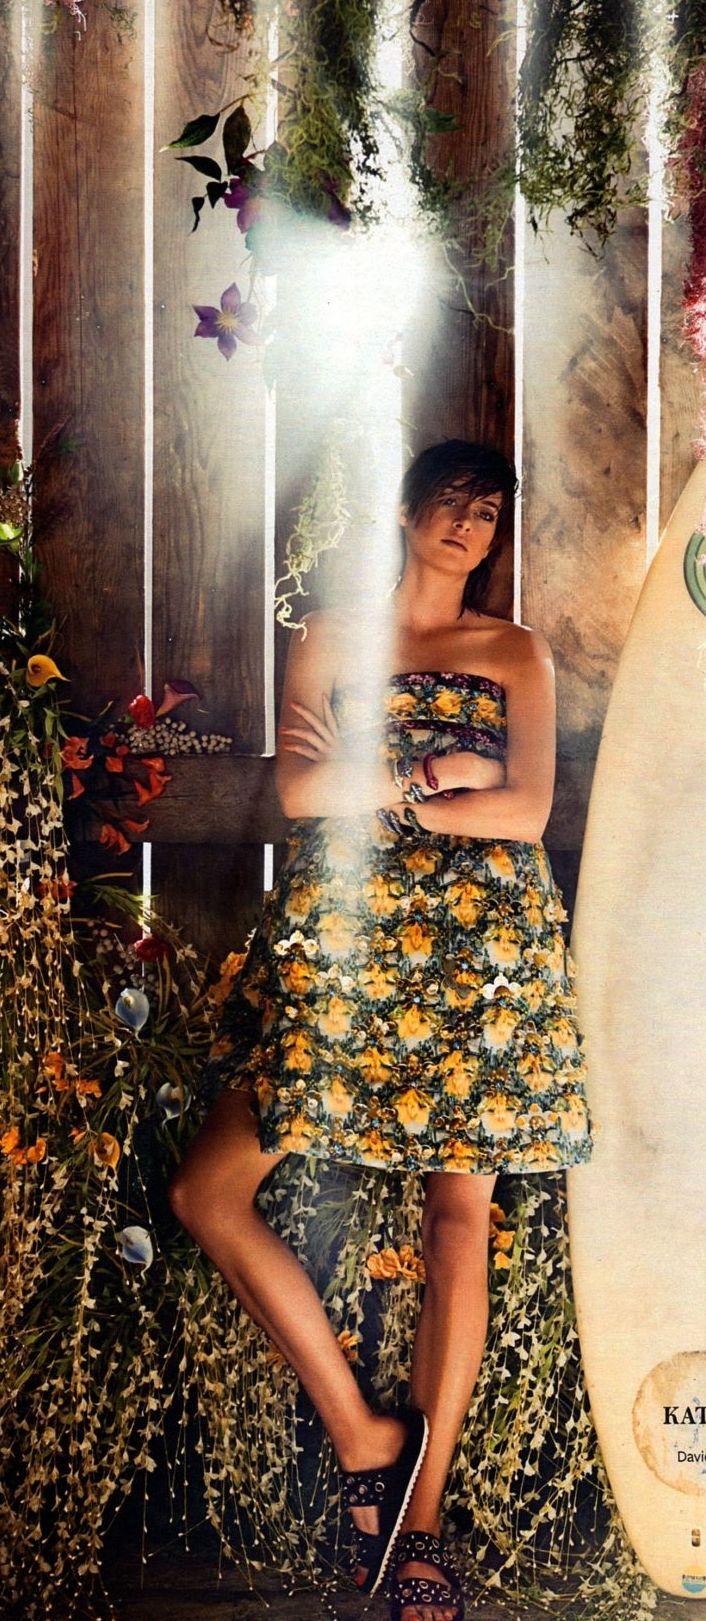 Shailene Woodley for InStyle June 2014